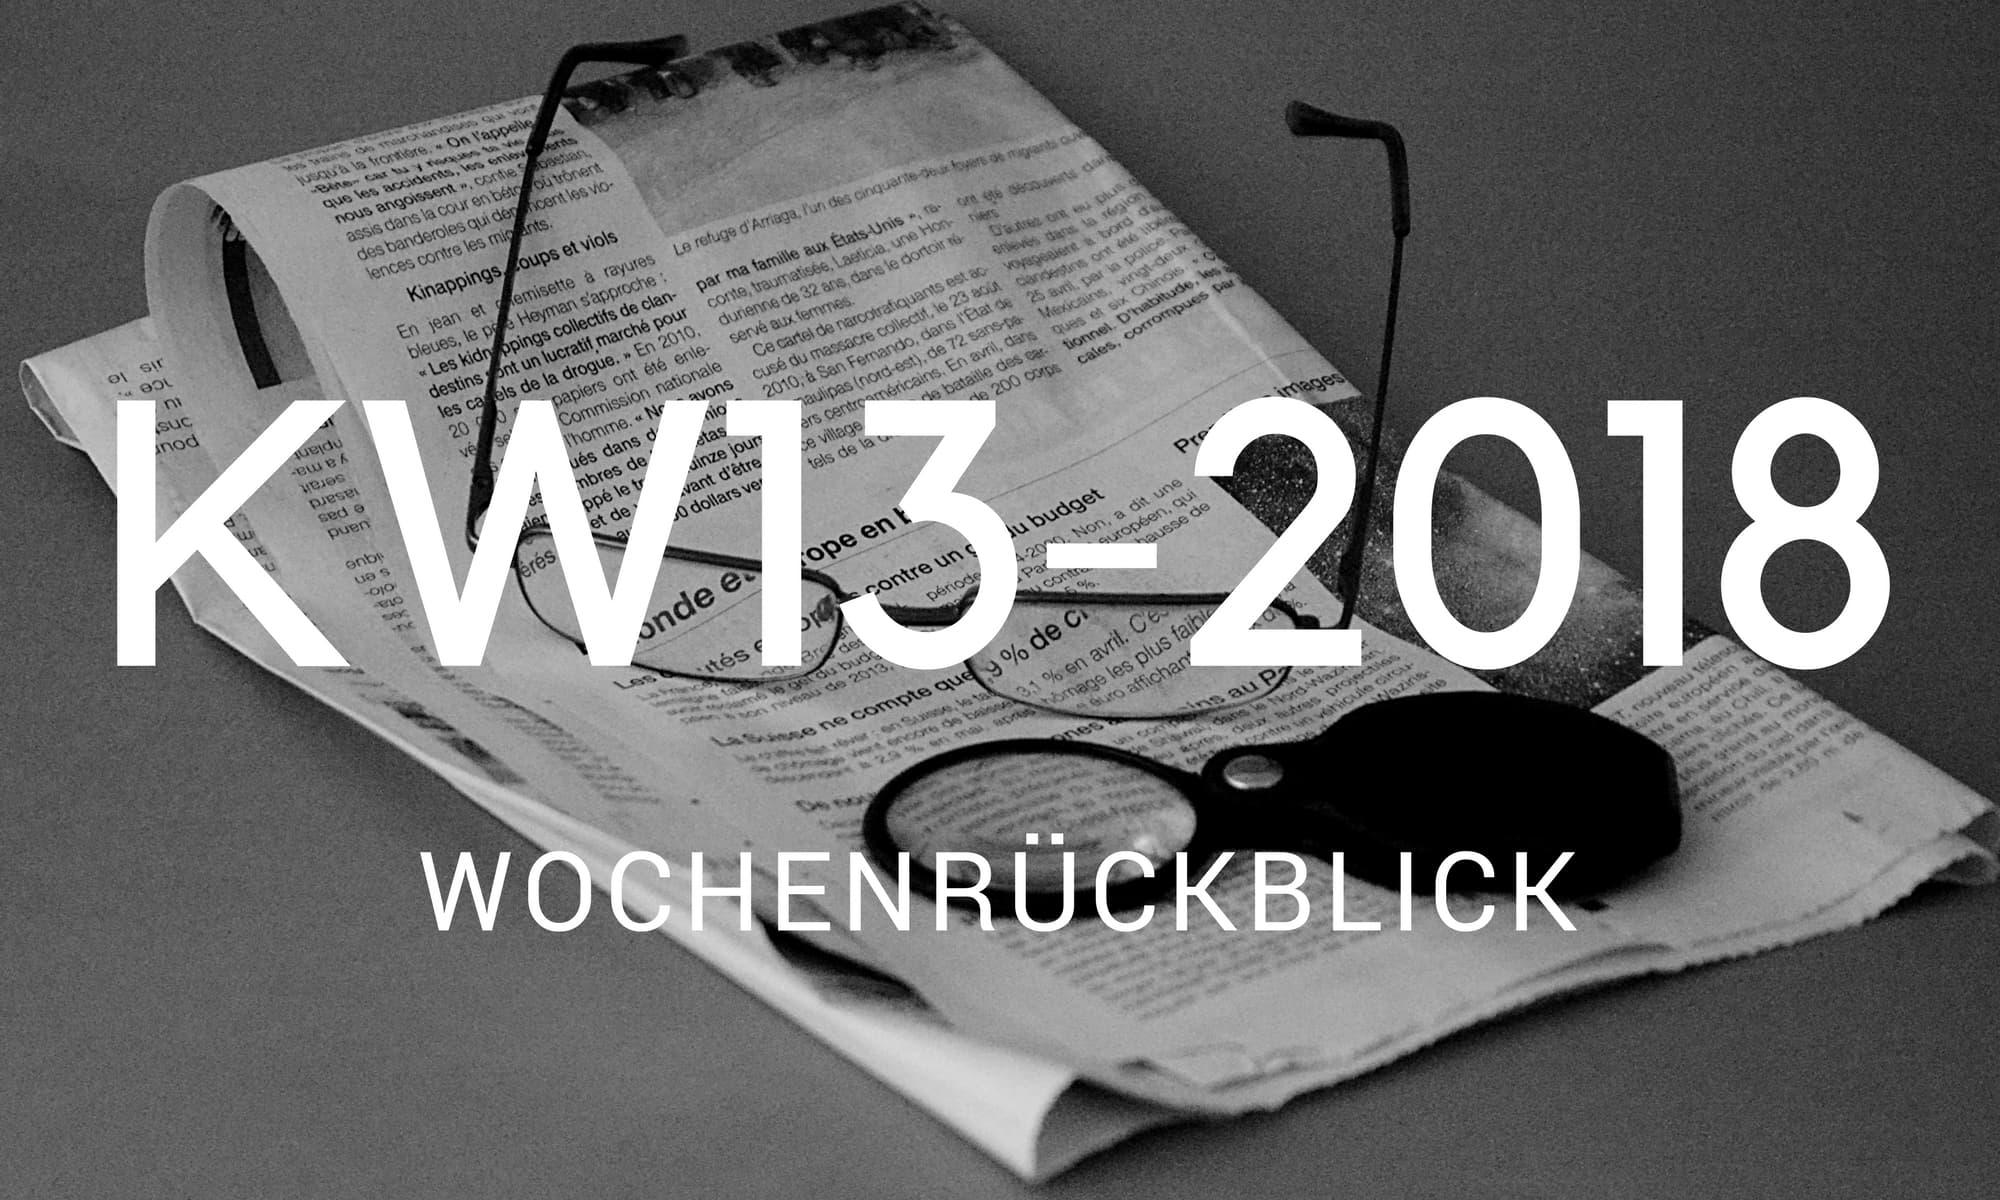 wochenrueckblick camping news KW13 2018